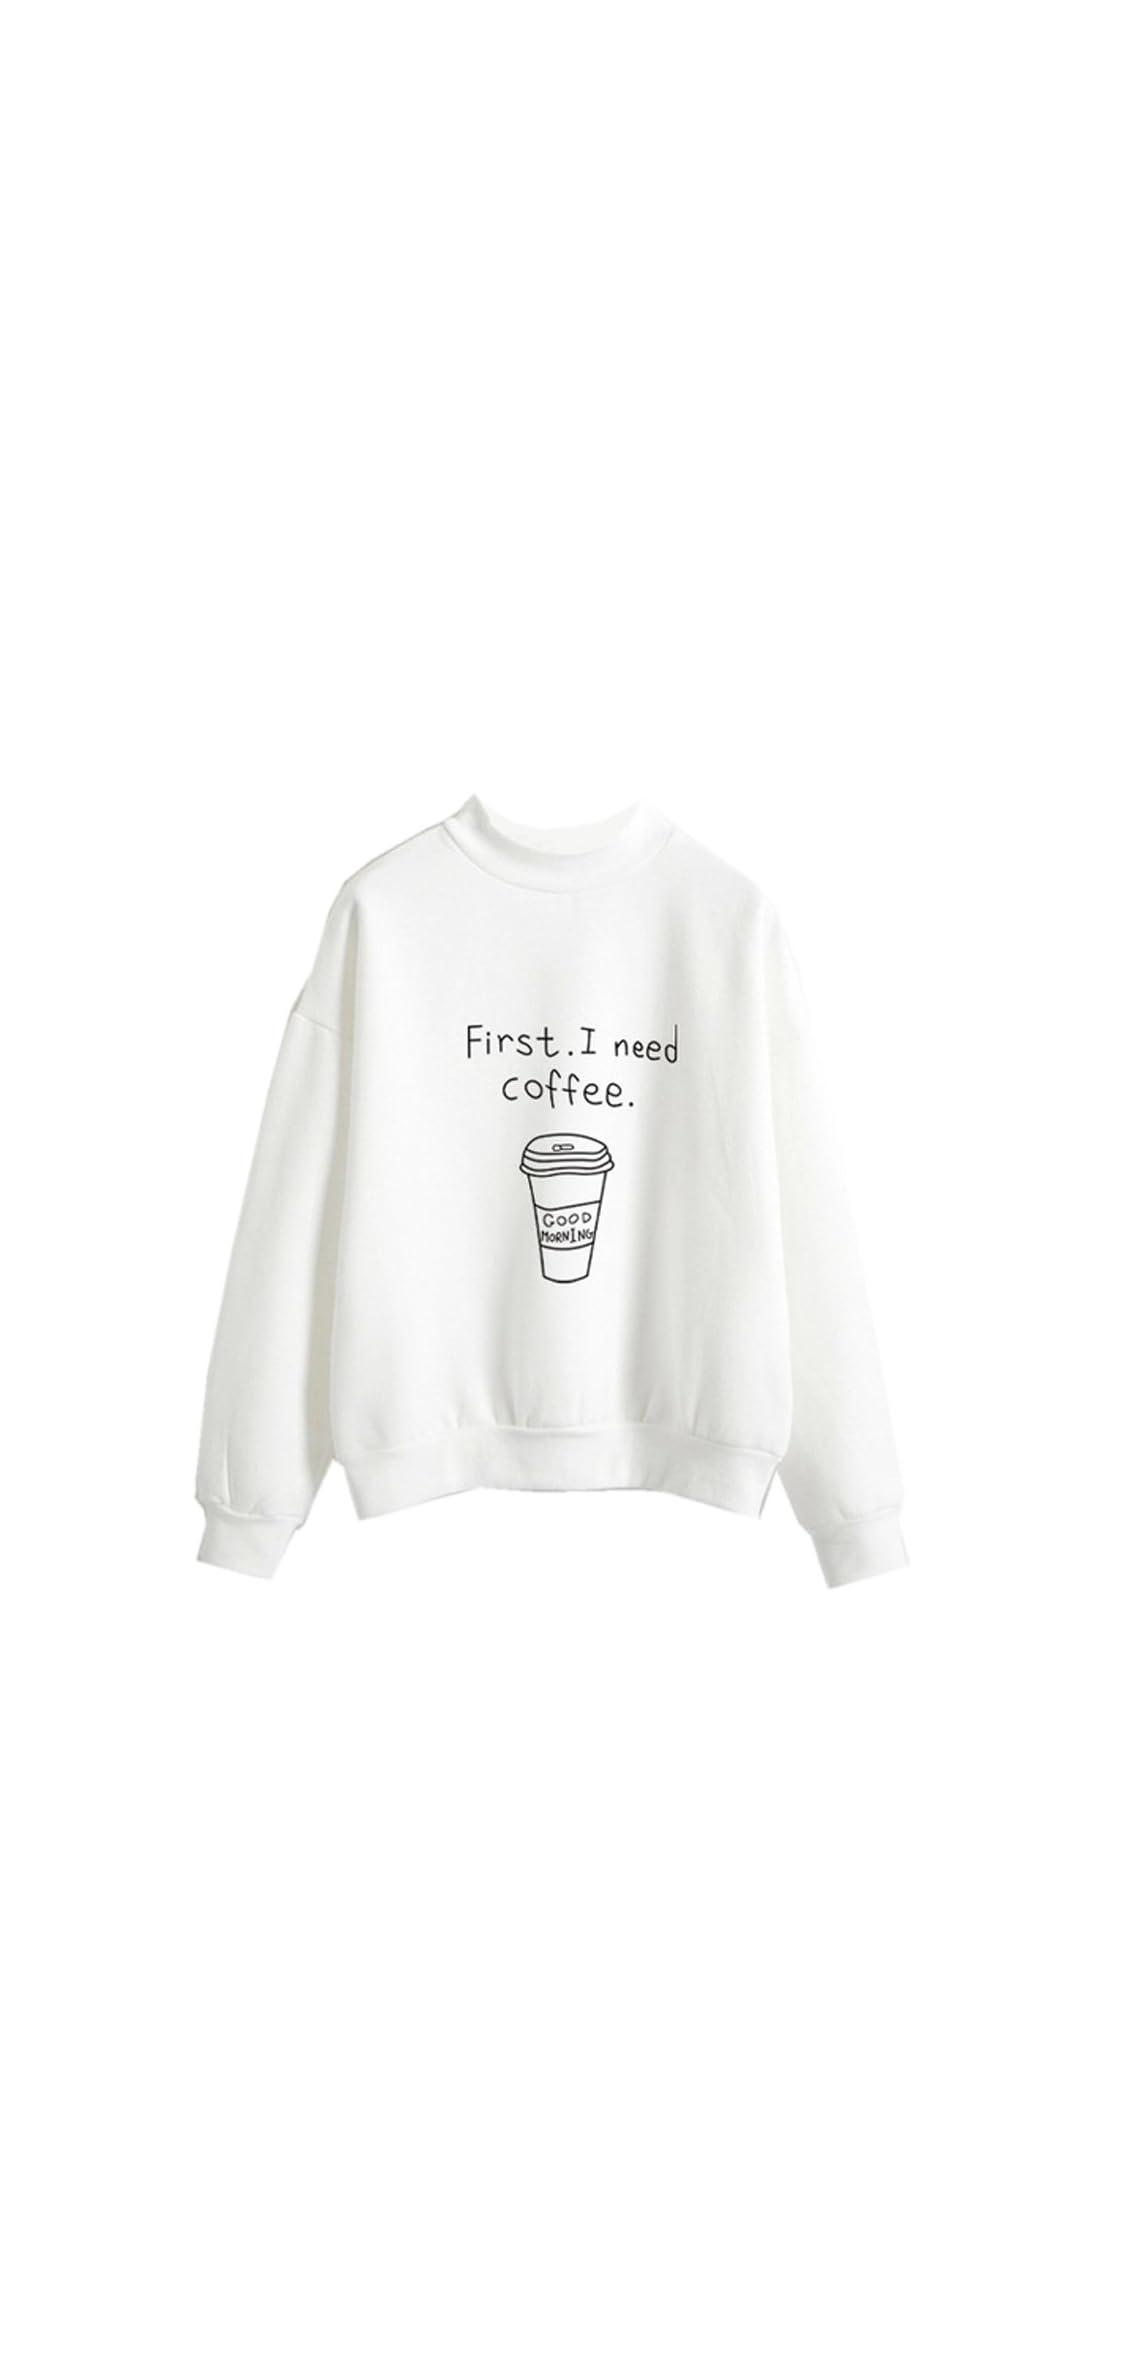 Harajuku Pastel Sweater First I Need Coffee Cute Tumblr Shirts